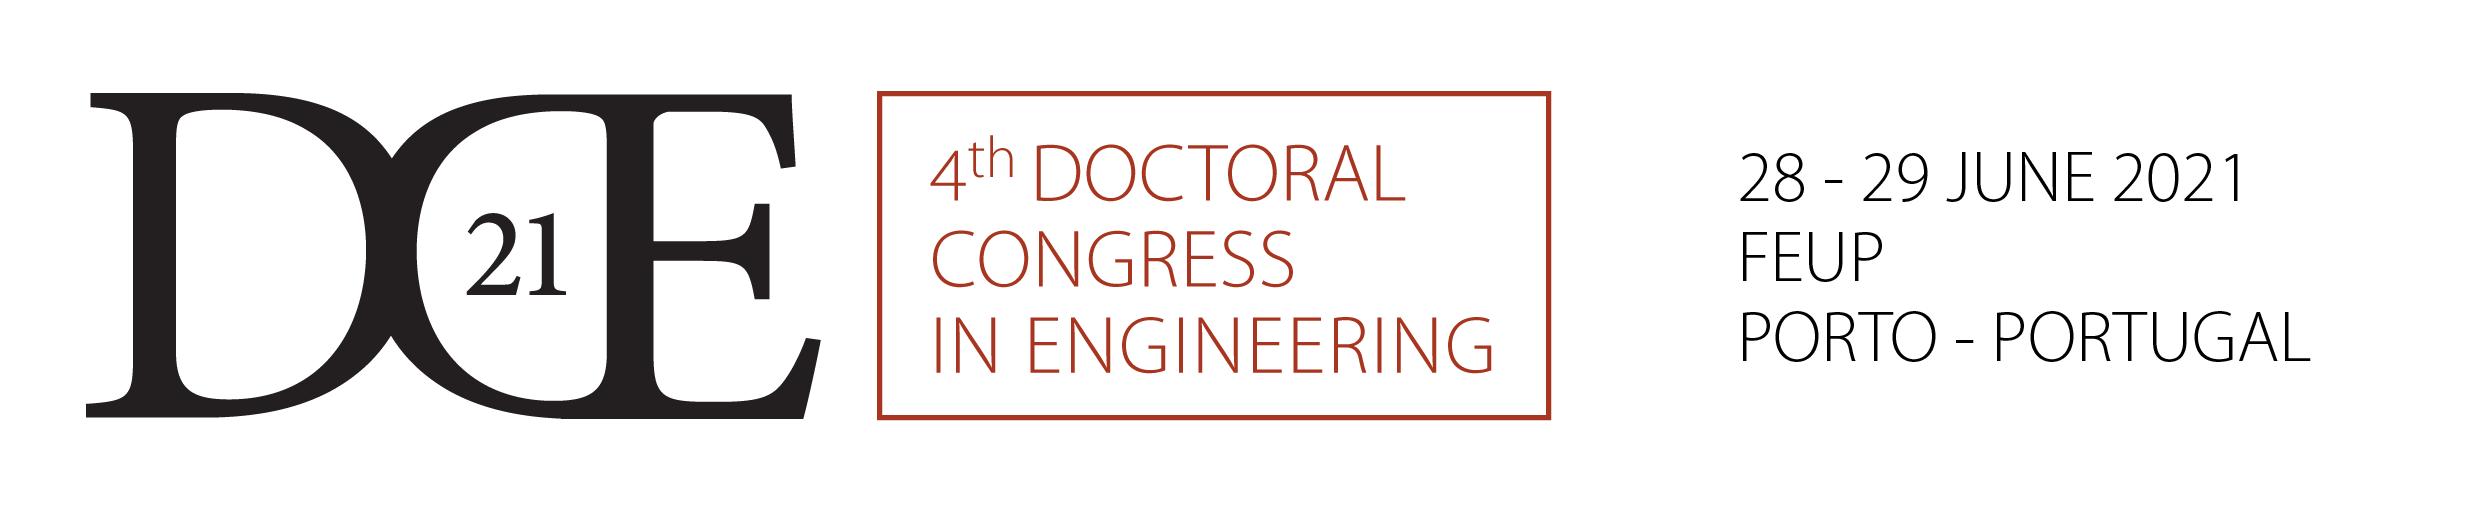 DCE 2021 Logo